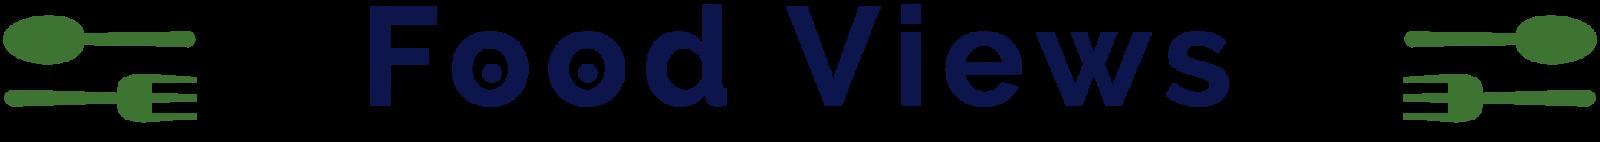 foodviews logo